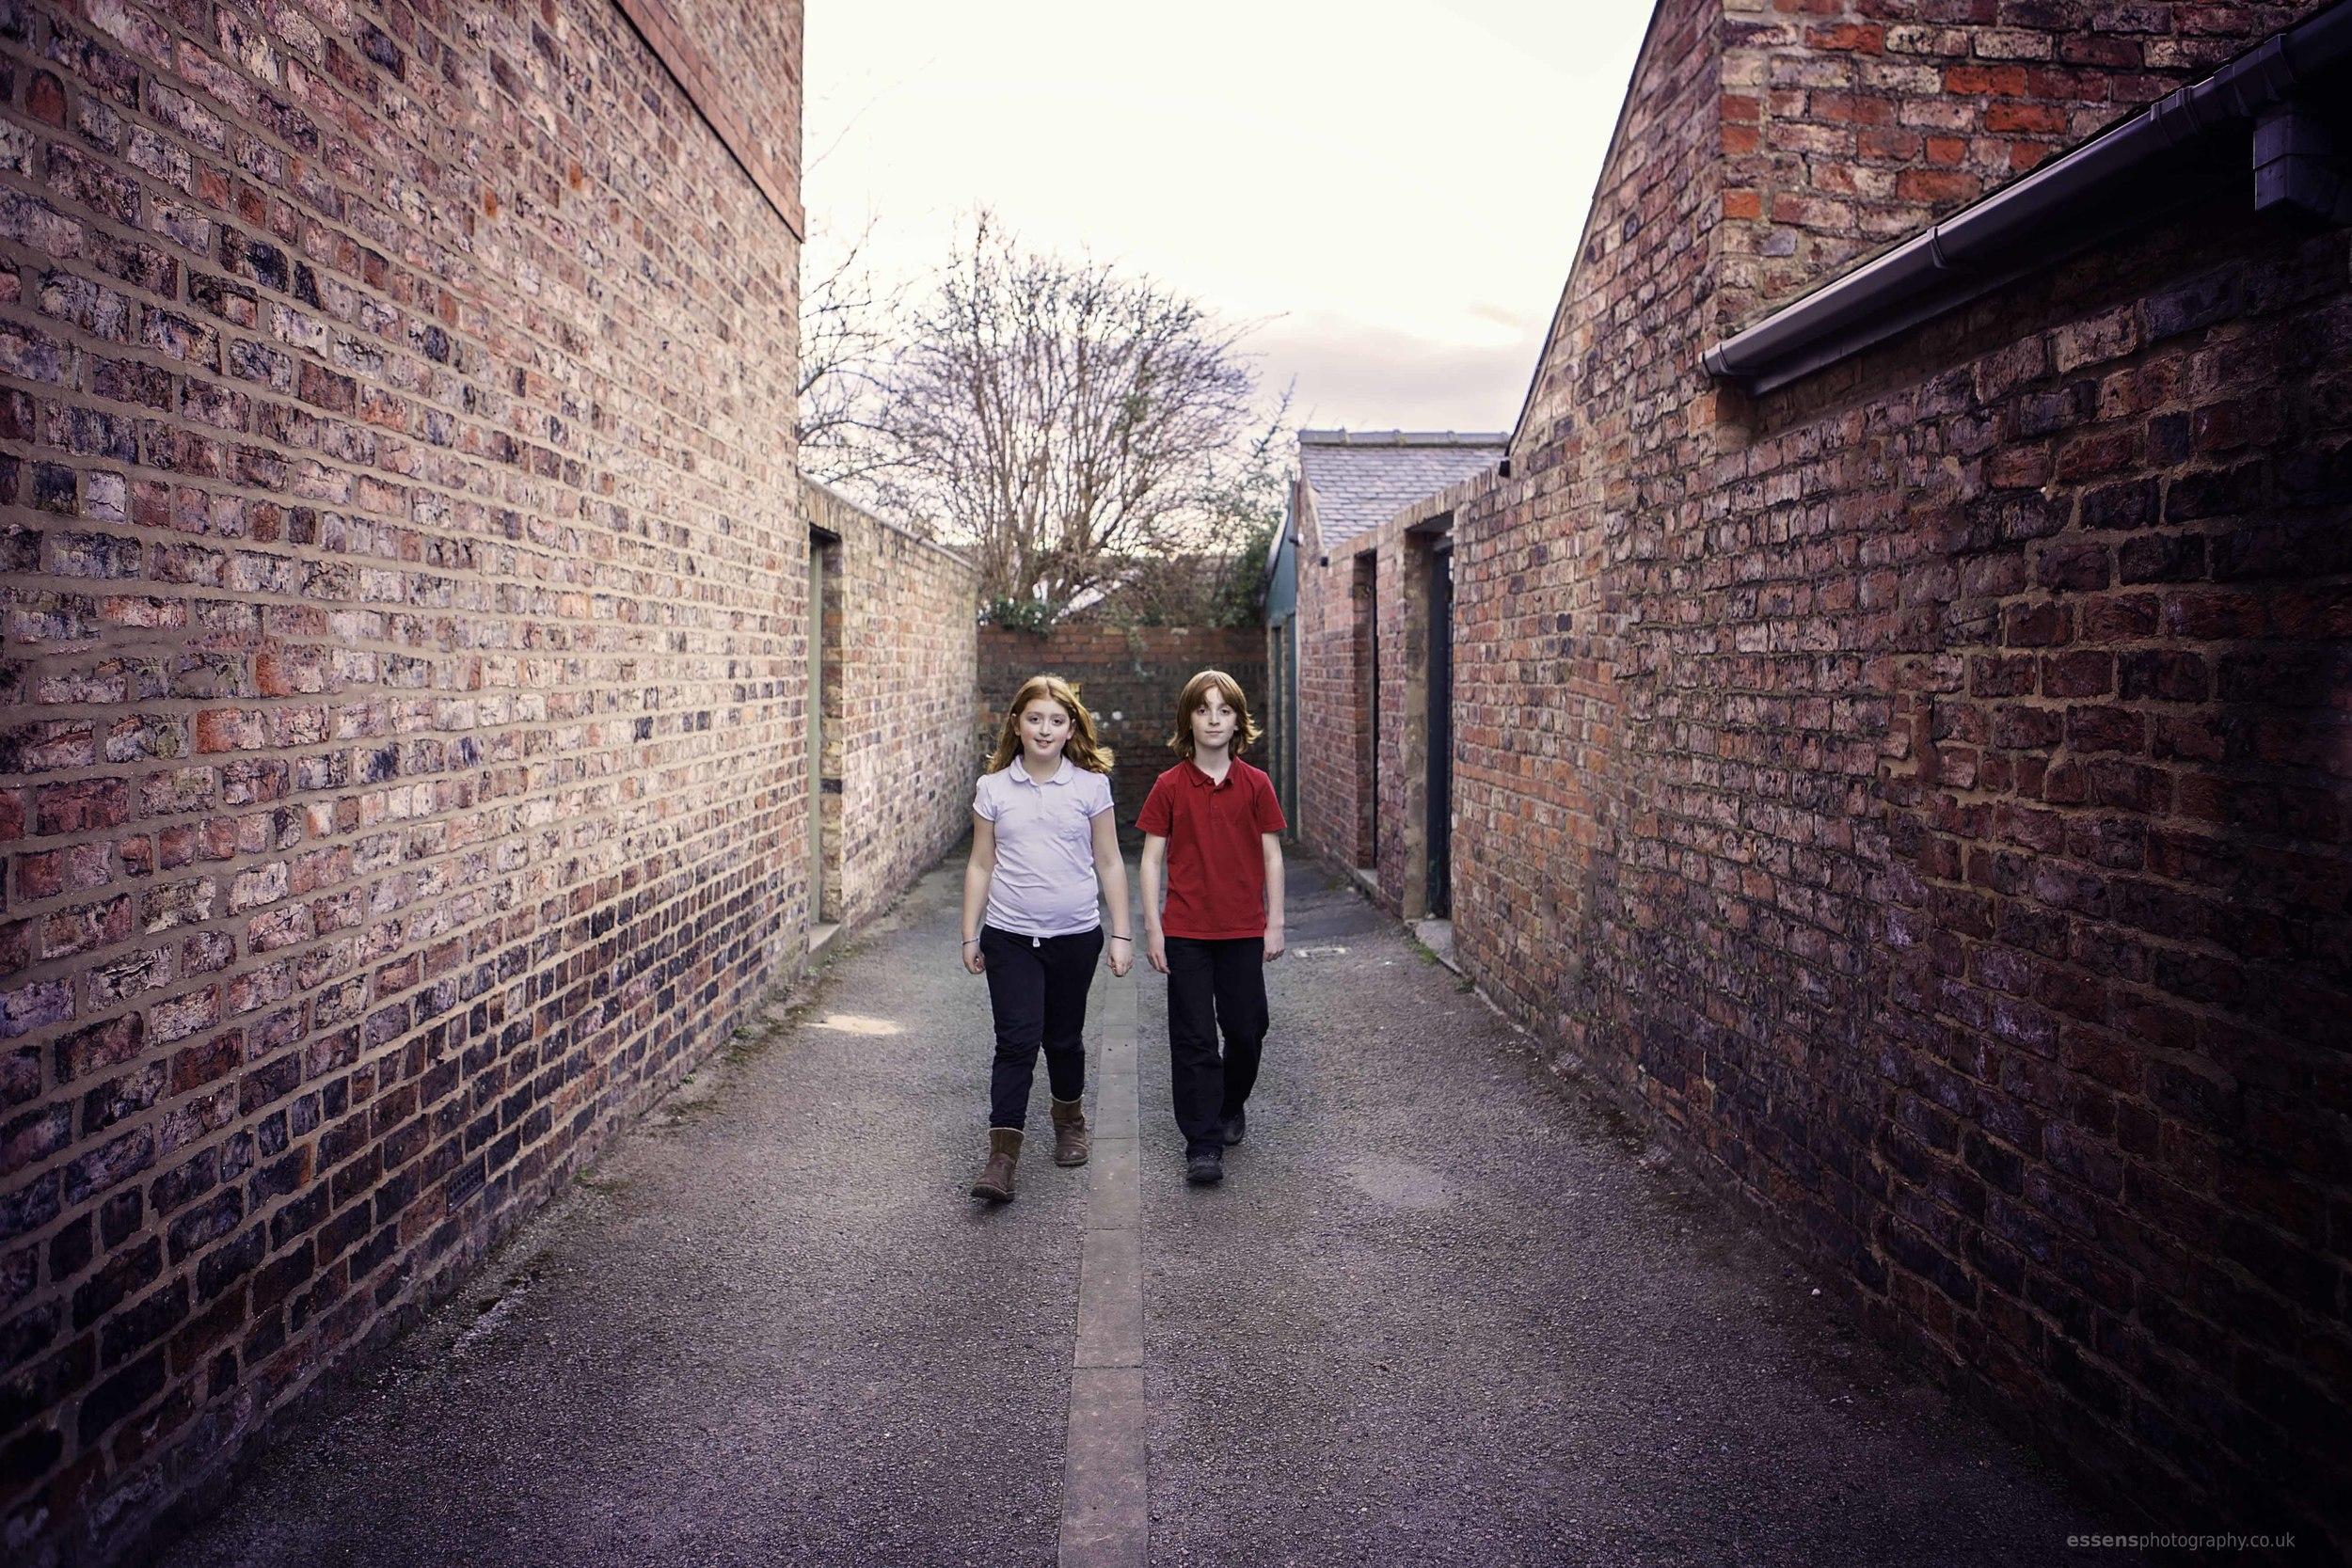 Alley way.jpg